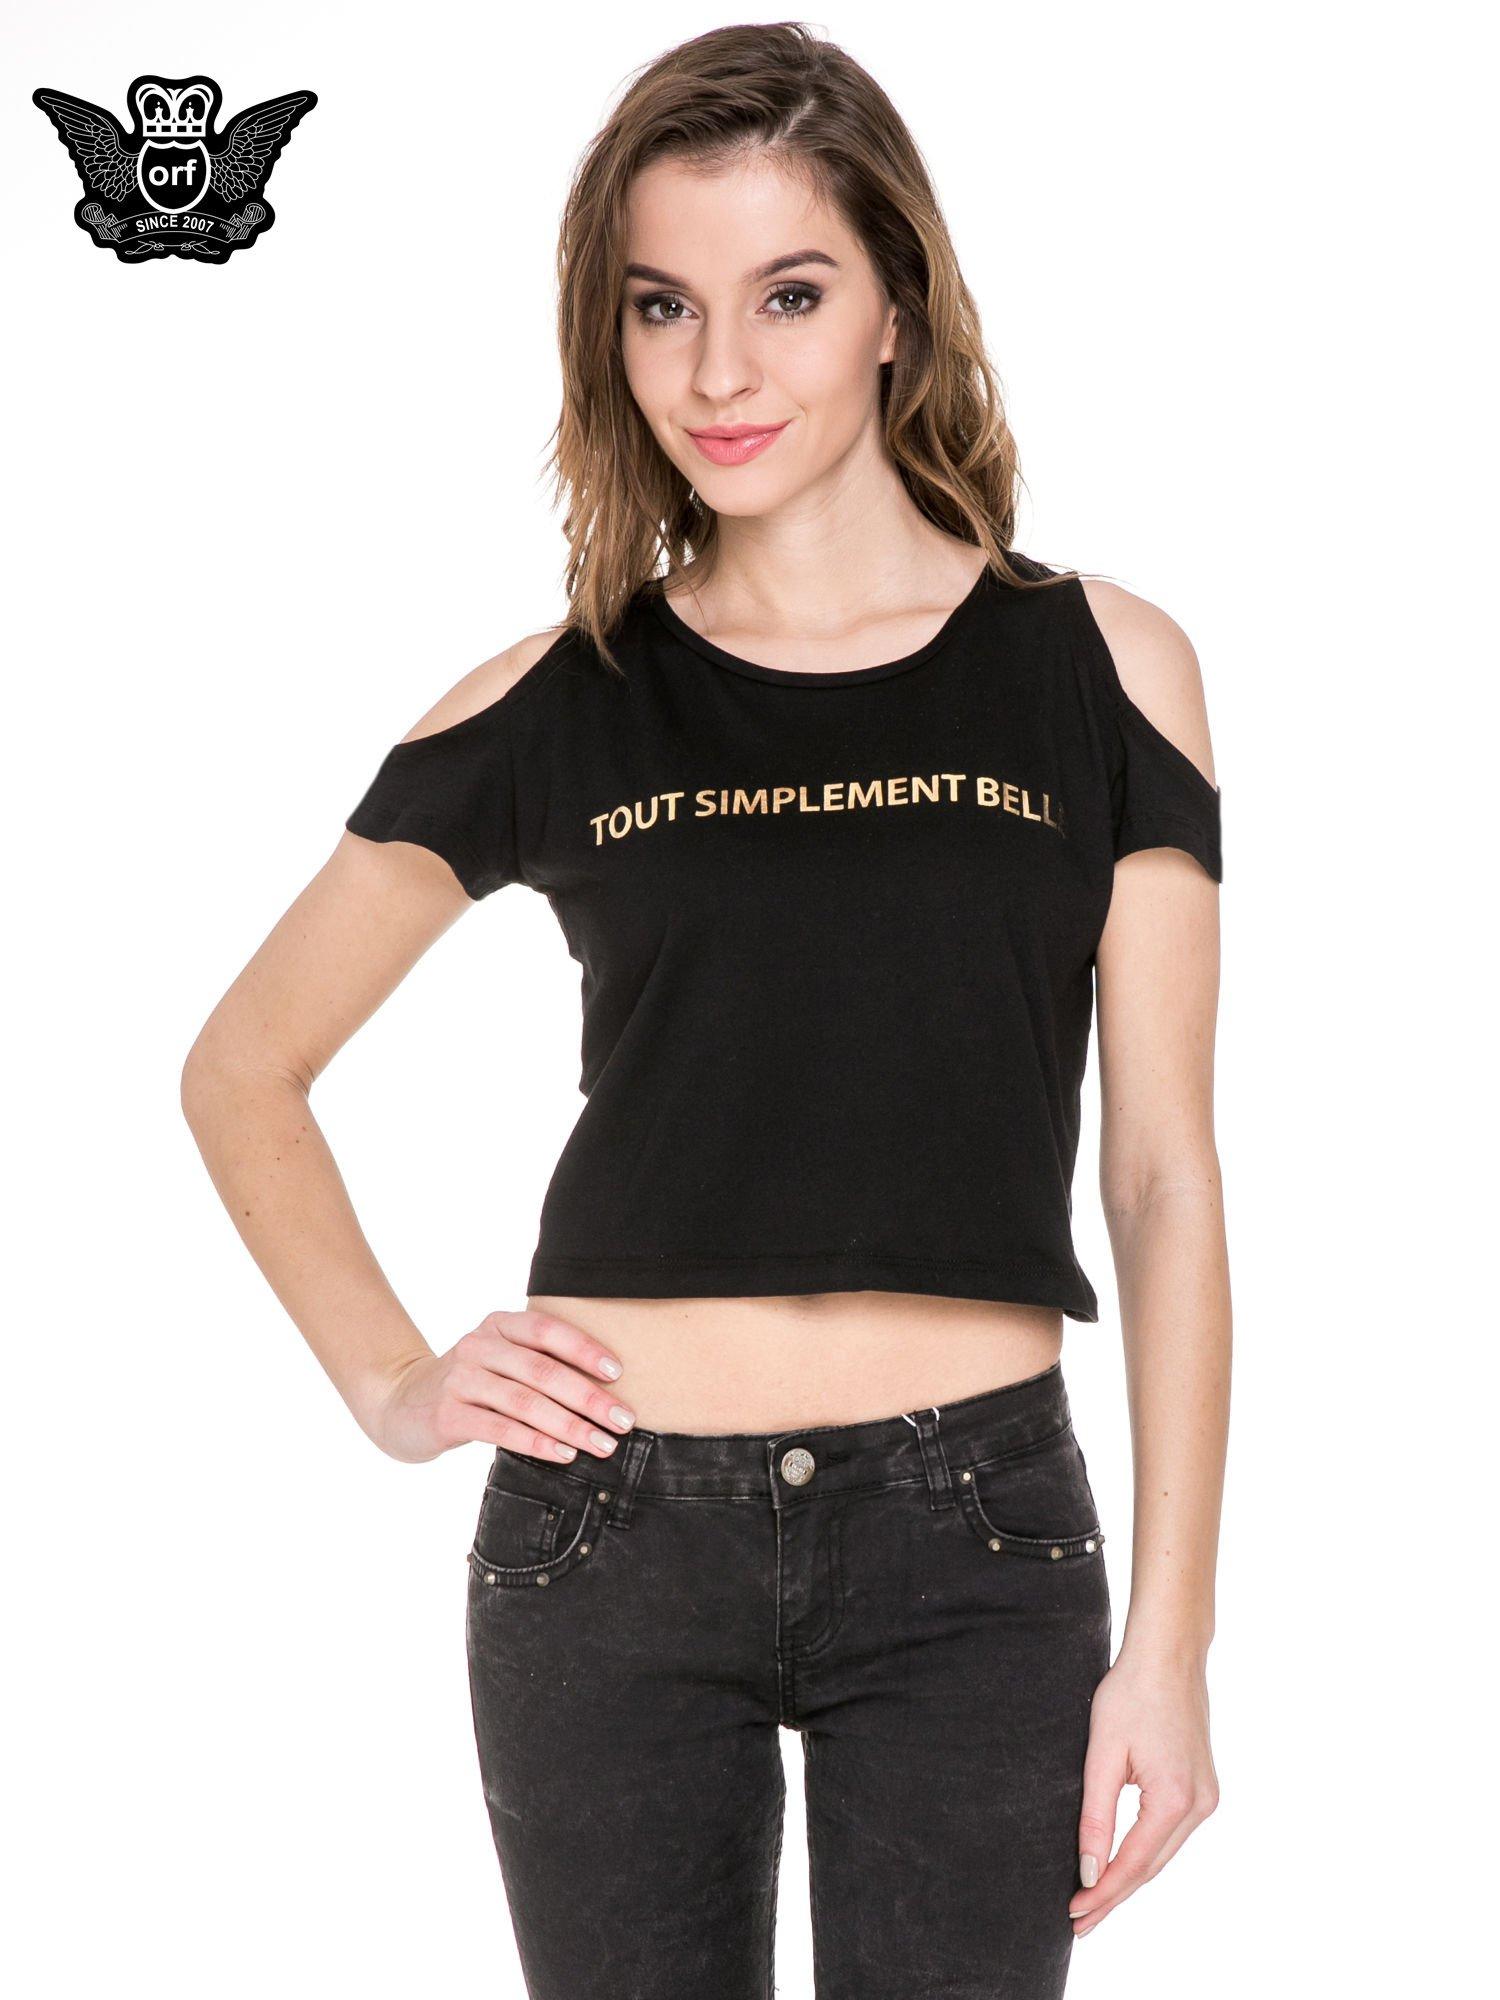 Czarny krótki t-shirt ze słotym nadrukiem TOUT SIMPLEMENT BELLE i rękawami cut out                                  zdj.                                  1